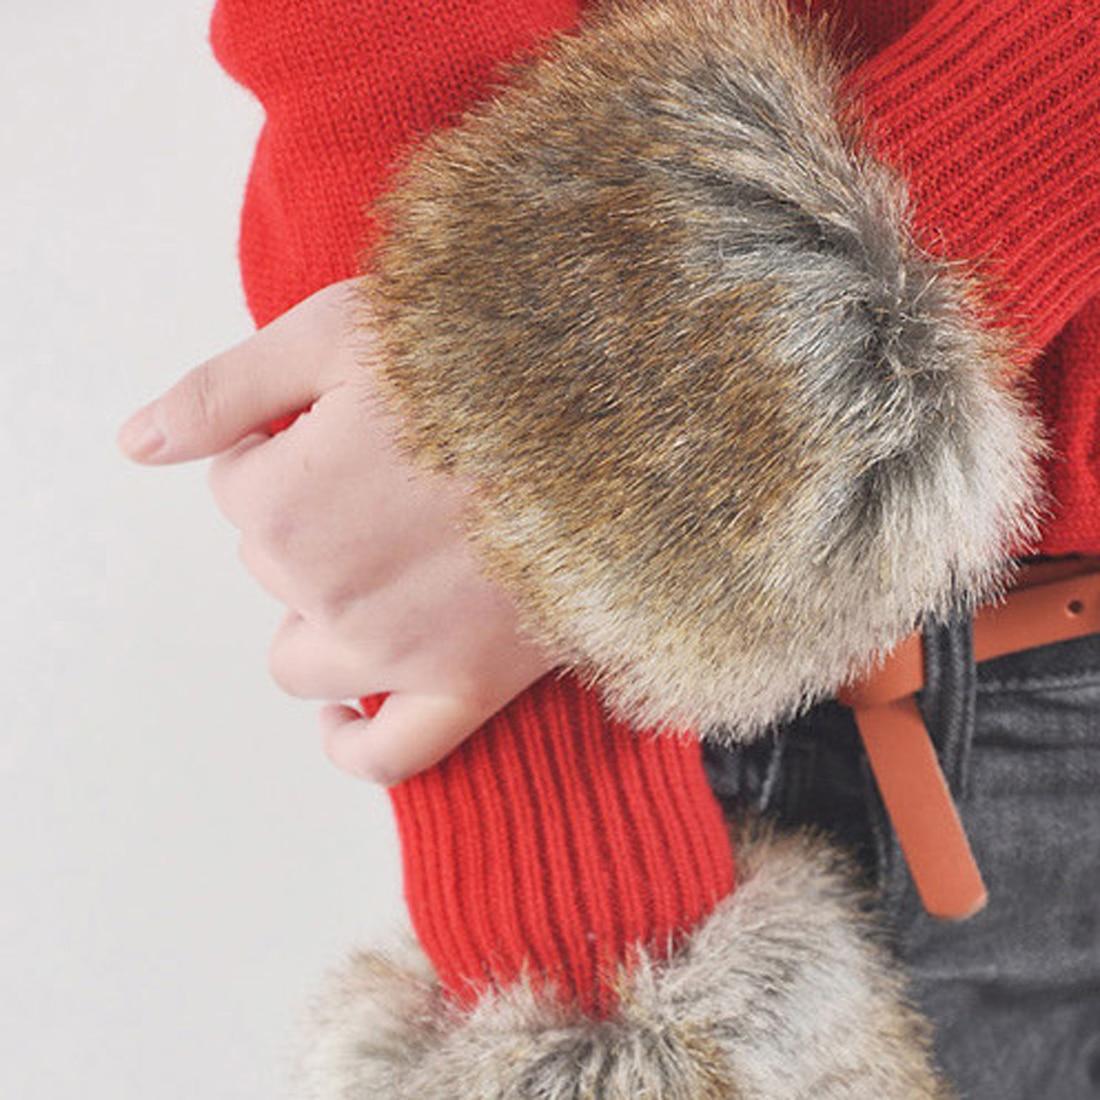 Fashion Women Winter Arm Warmers Faux Fur Wrist Slap On Cuffs Solid Ladies Plush Wrist Protector Warmer Cuffs Arm Warmers Wraps